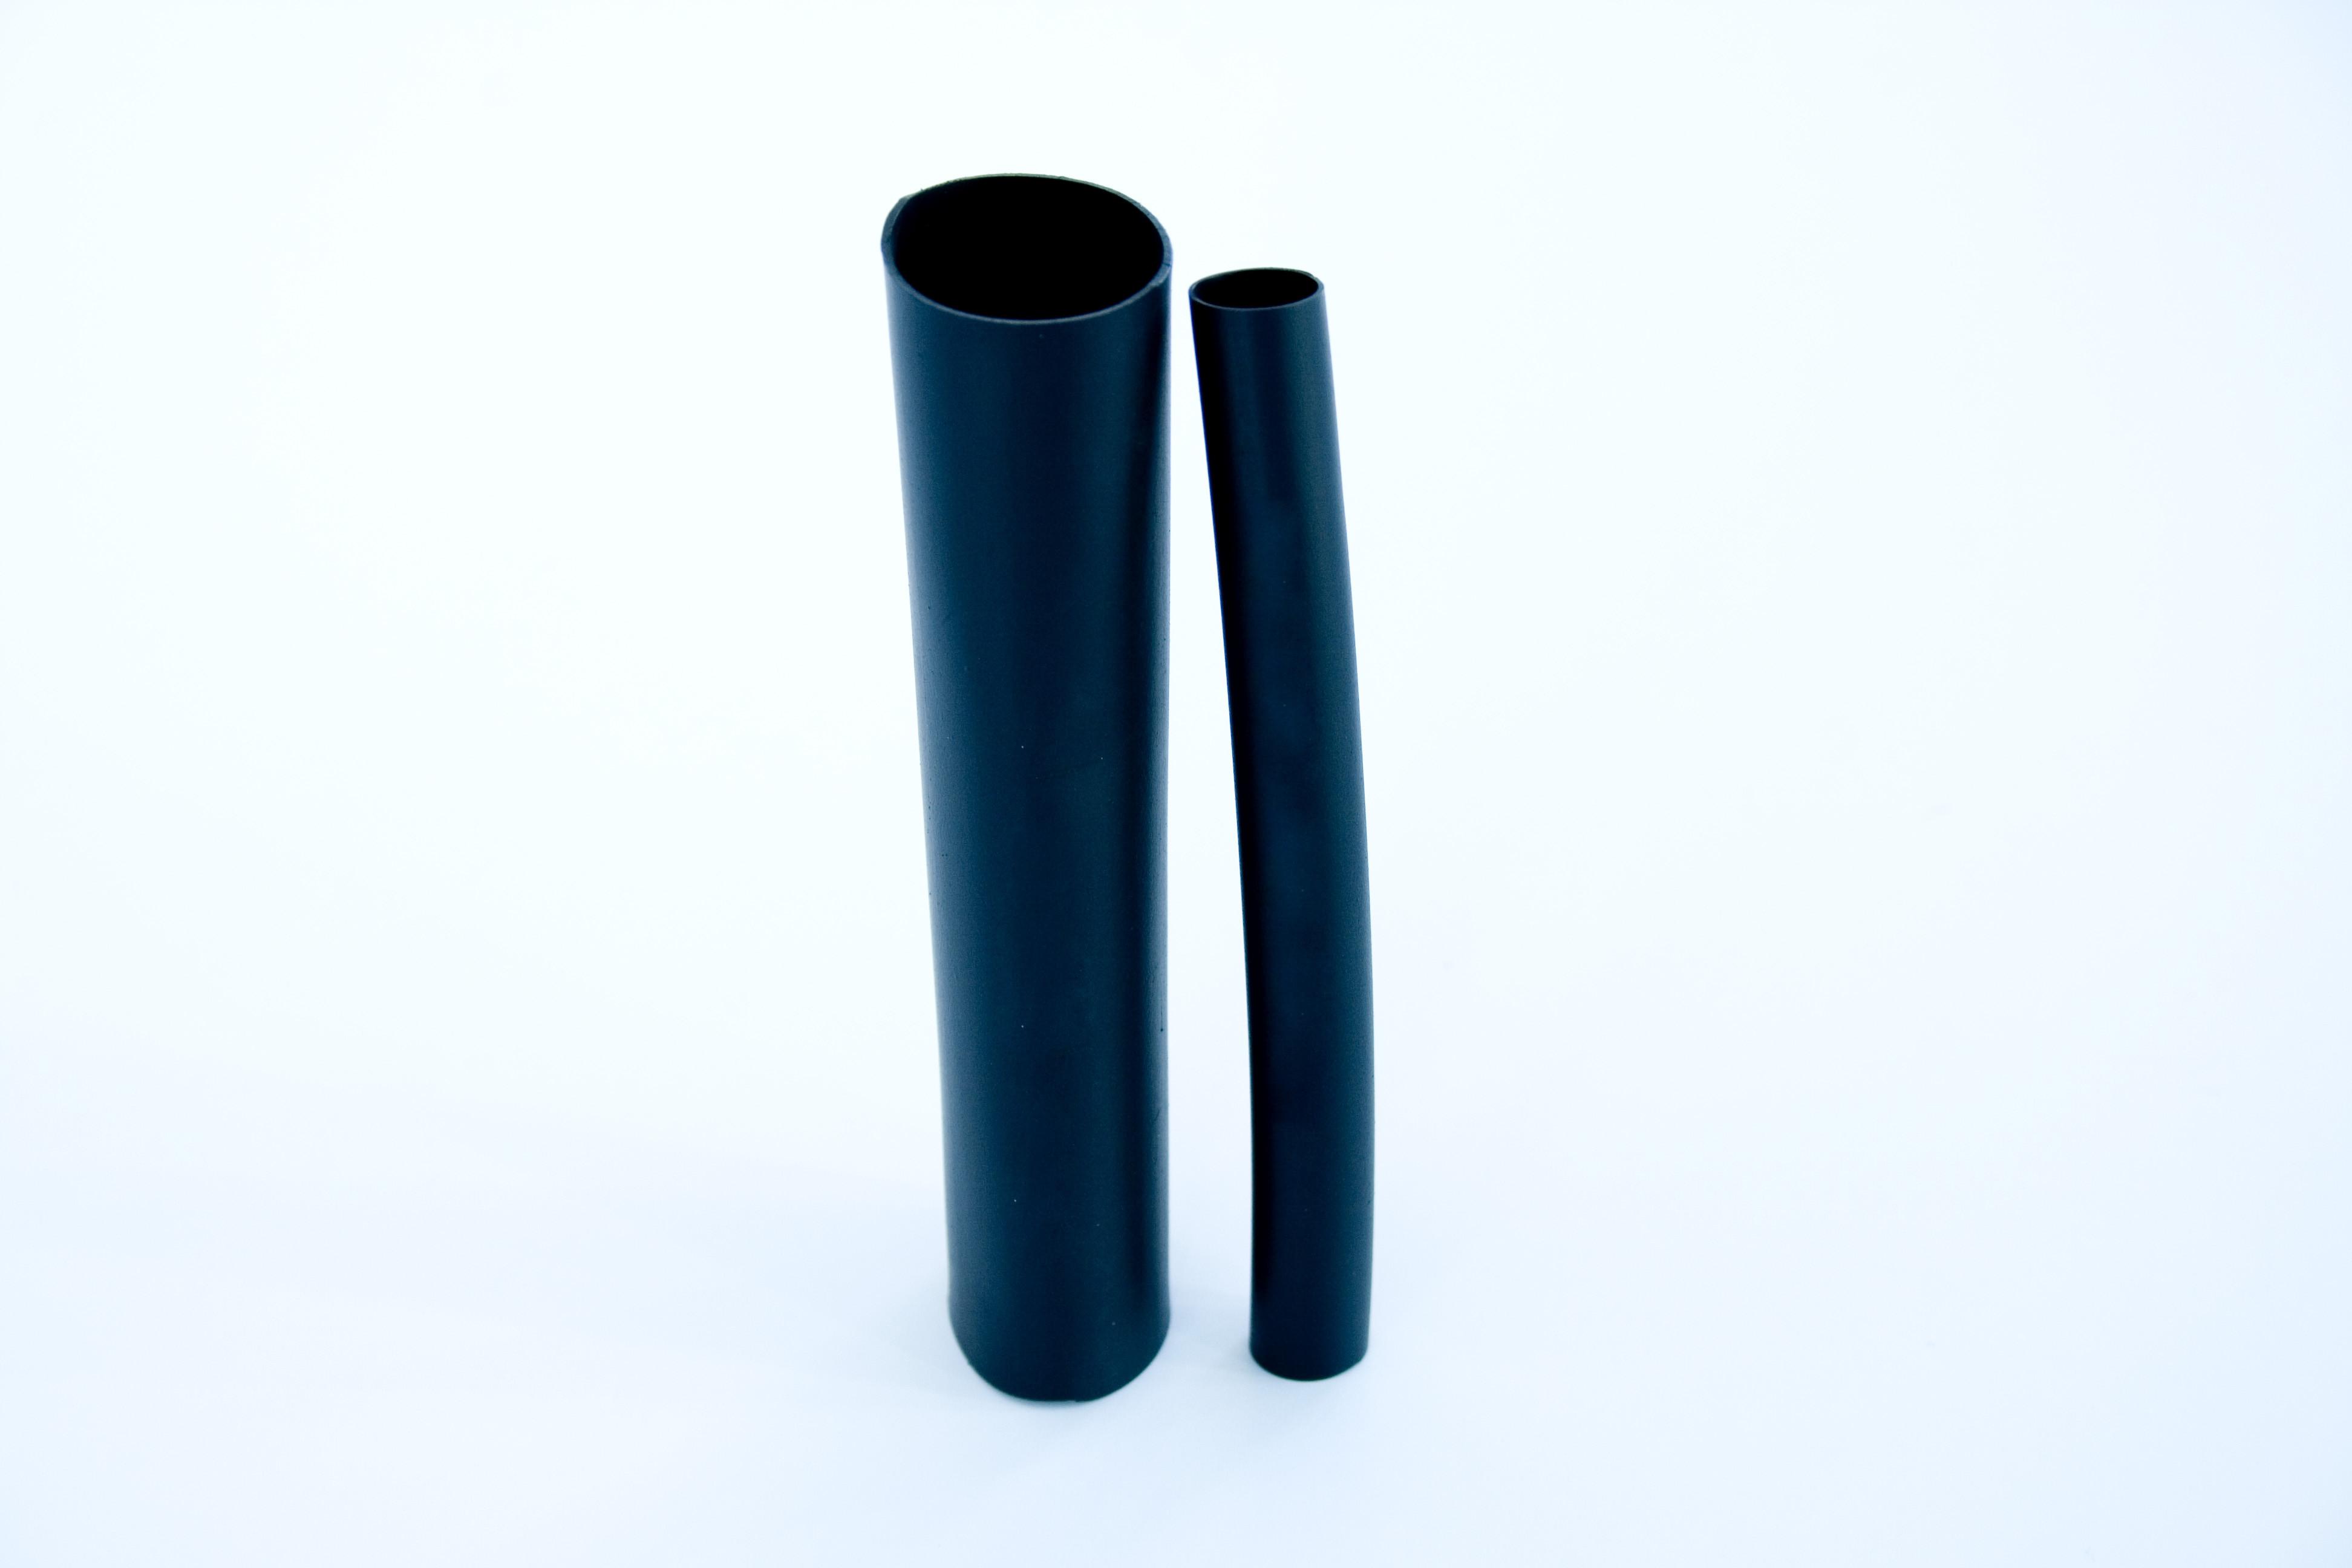 "VITON-HT Chemical Resistant High Temp Heat Shrink size 1 1/2""  Viton®-HT Size 1 1/2"" (38.1/19.0mm) Heat shrink tubing. Direct Equivalent to VITON®-E and RW-200-E"